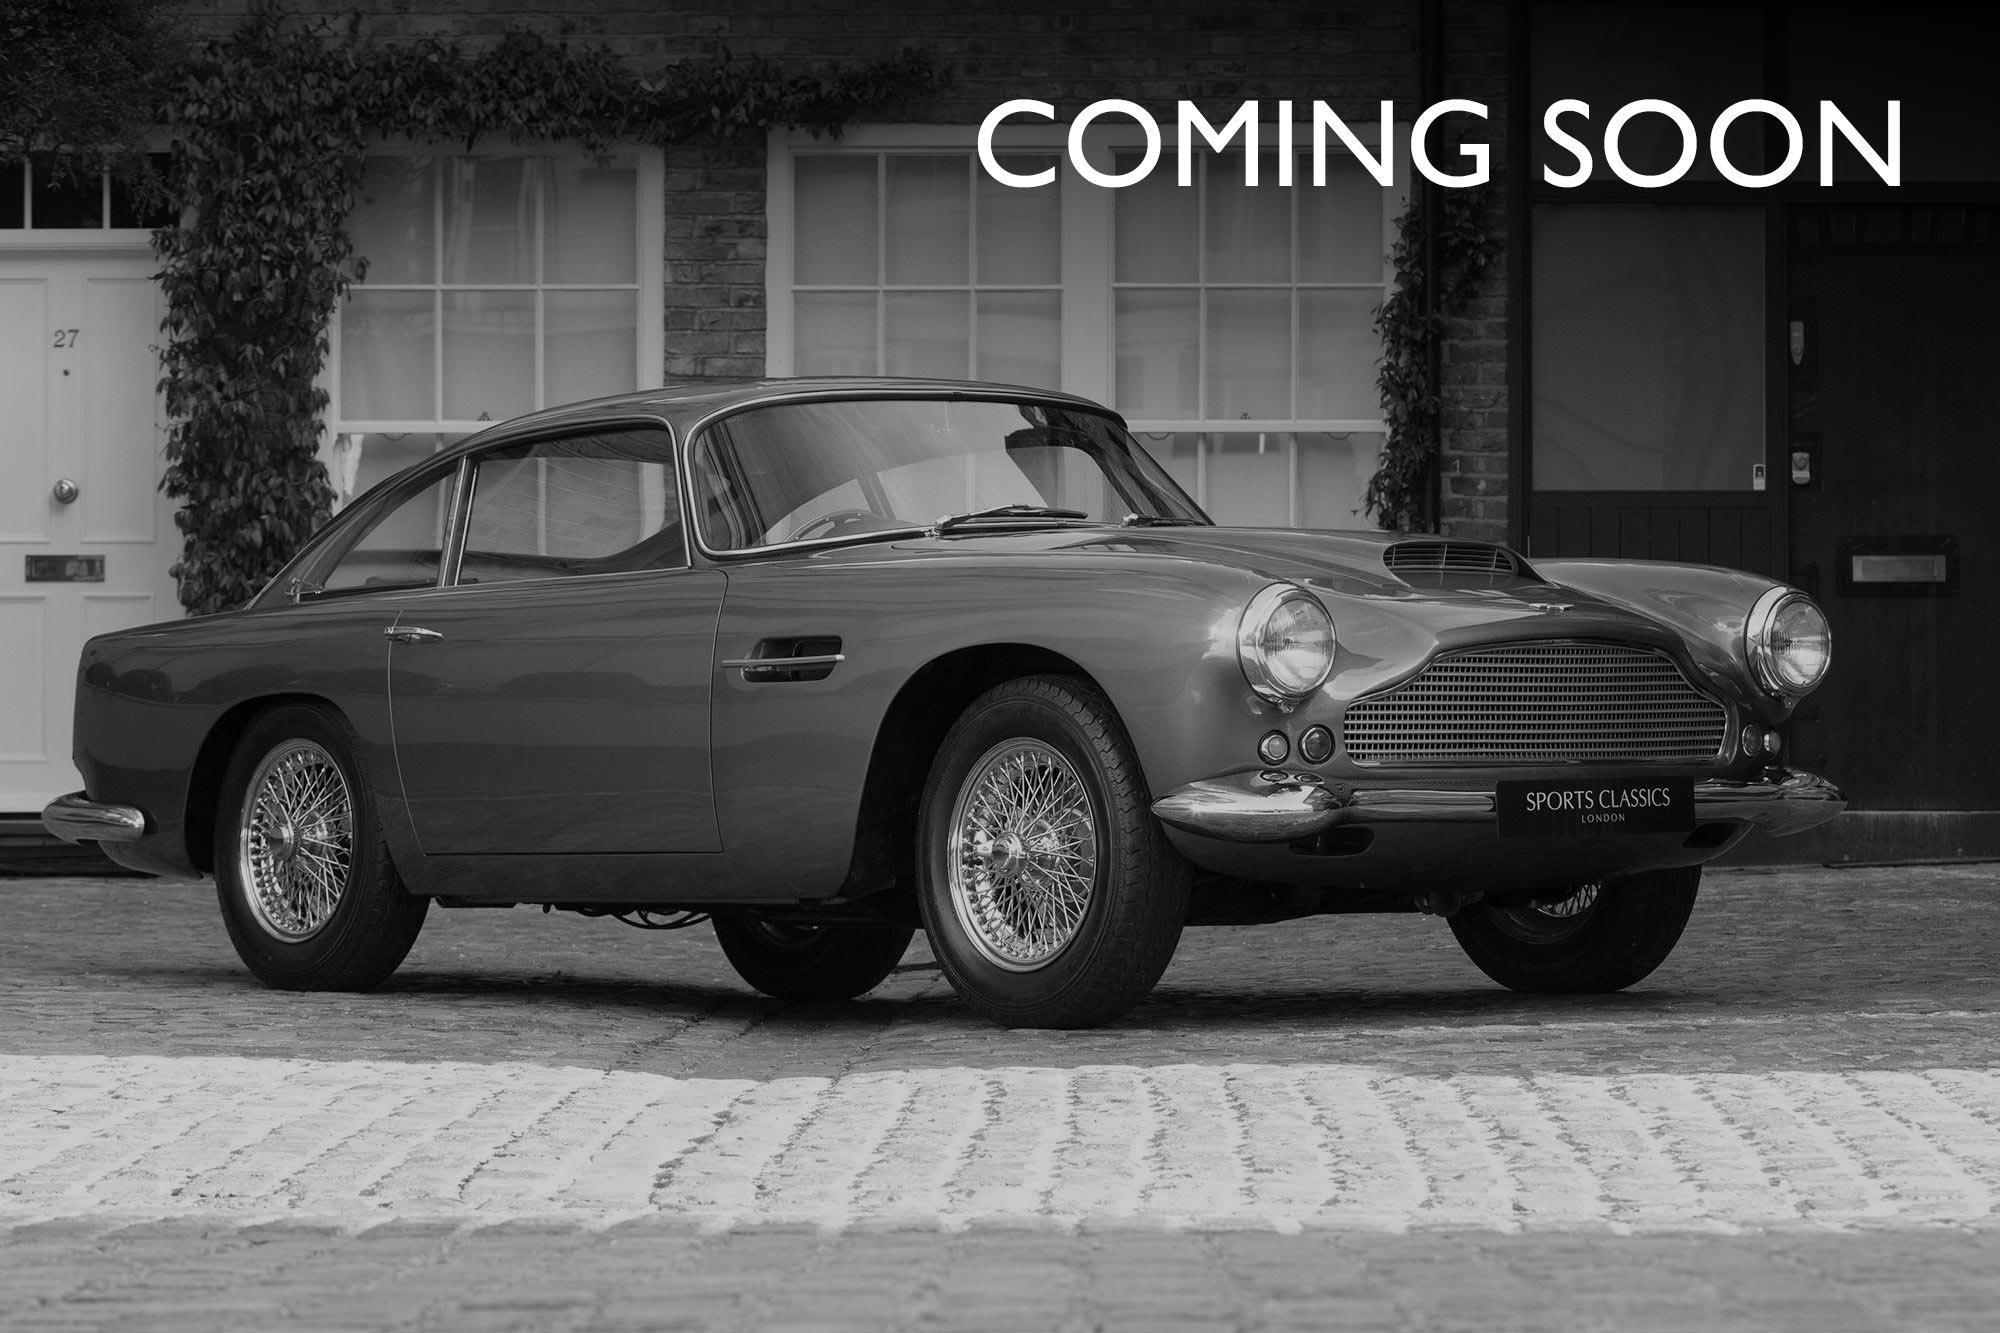 1959 Aston Martin DB4 Series 1